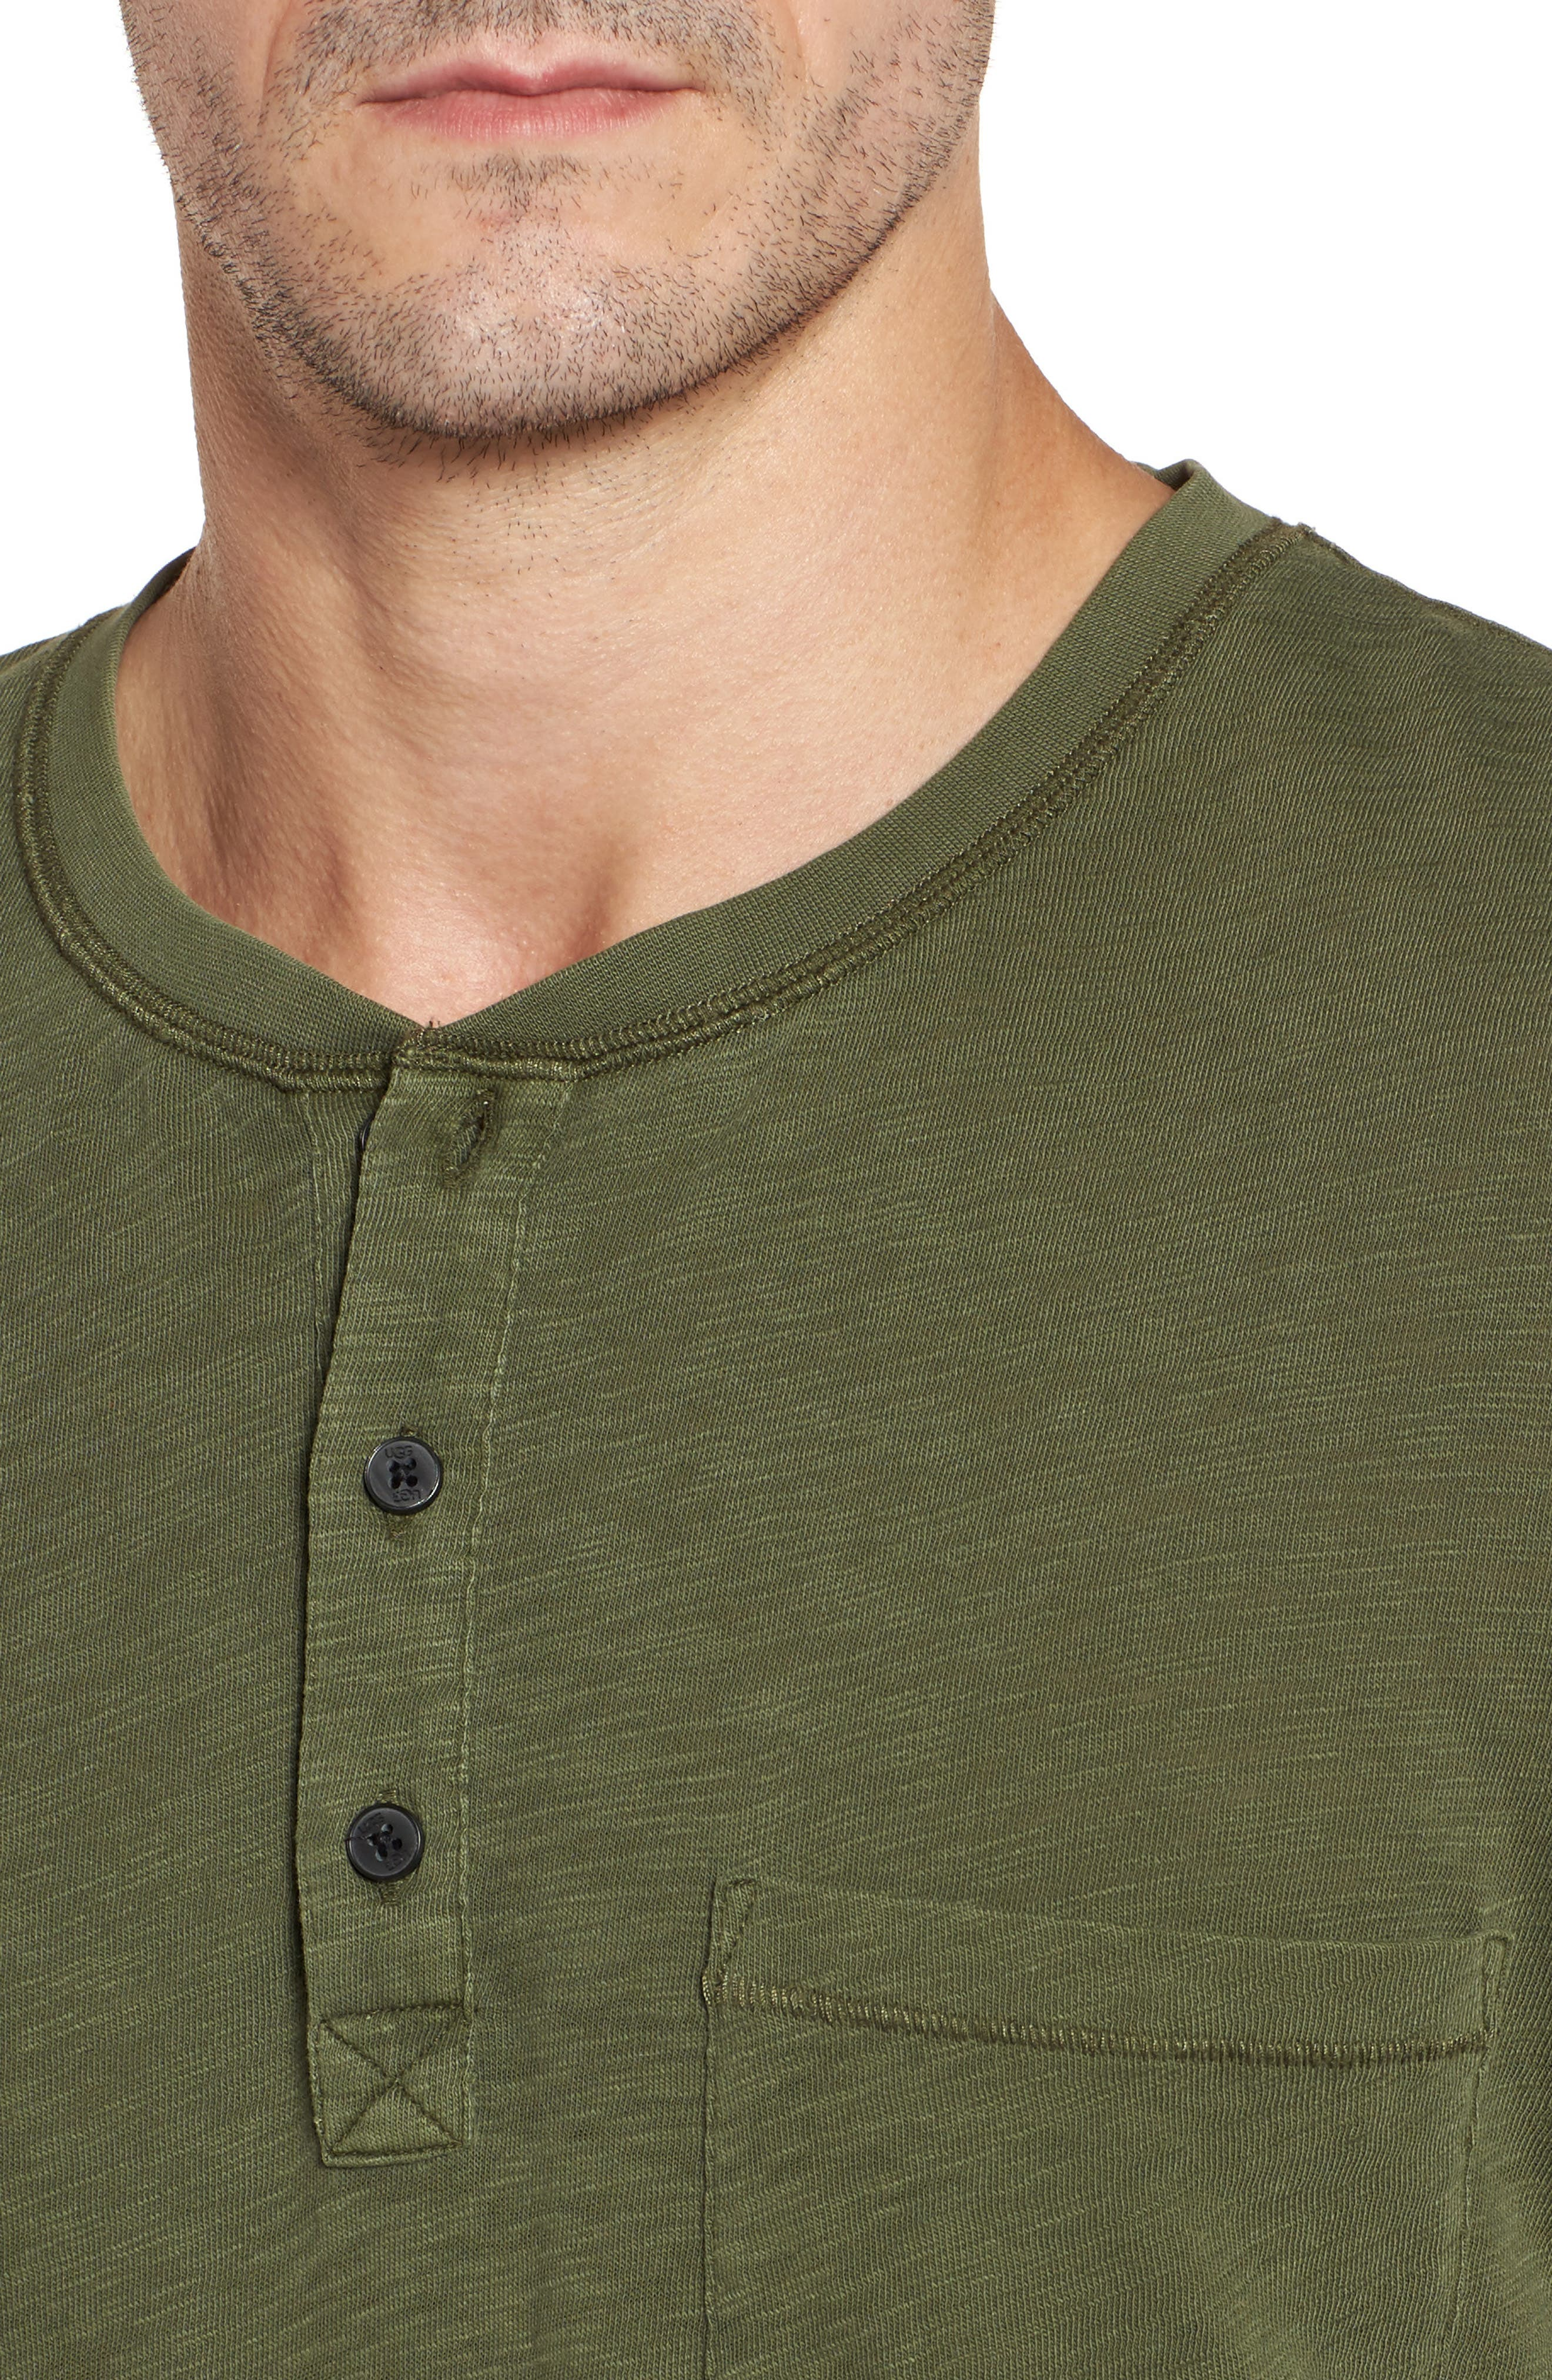 Long Sleeve Henley T-Shirt,                             Alternate thumbnail 4, color,                             Olive